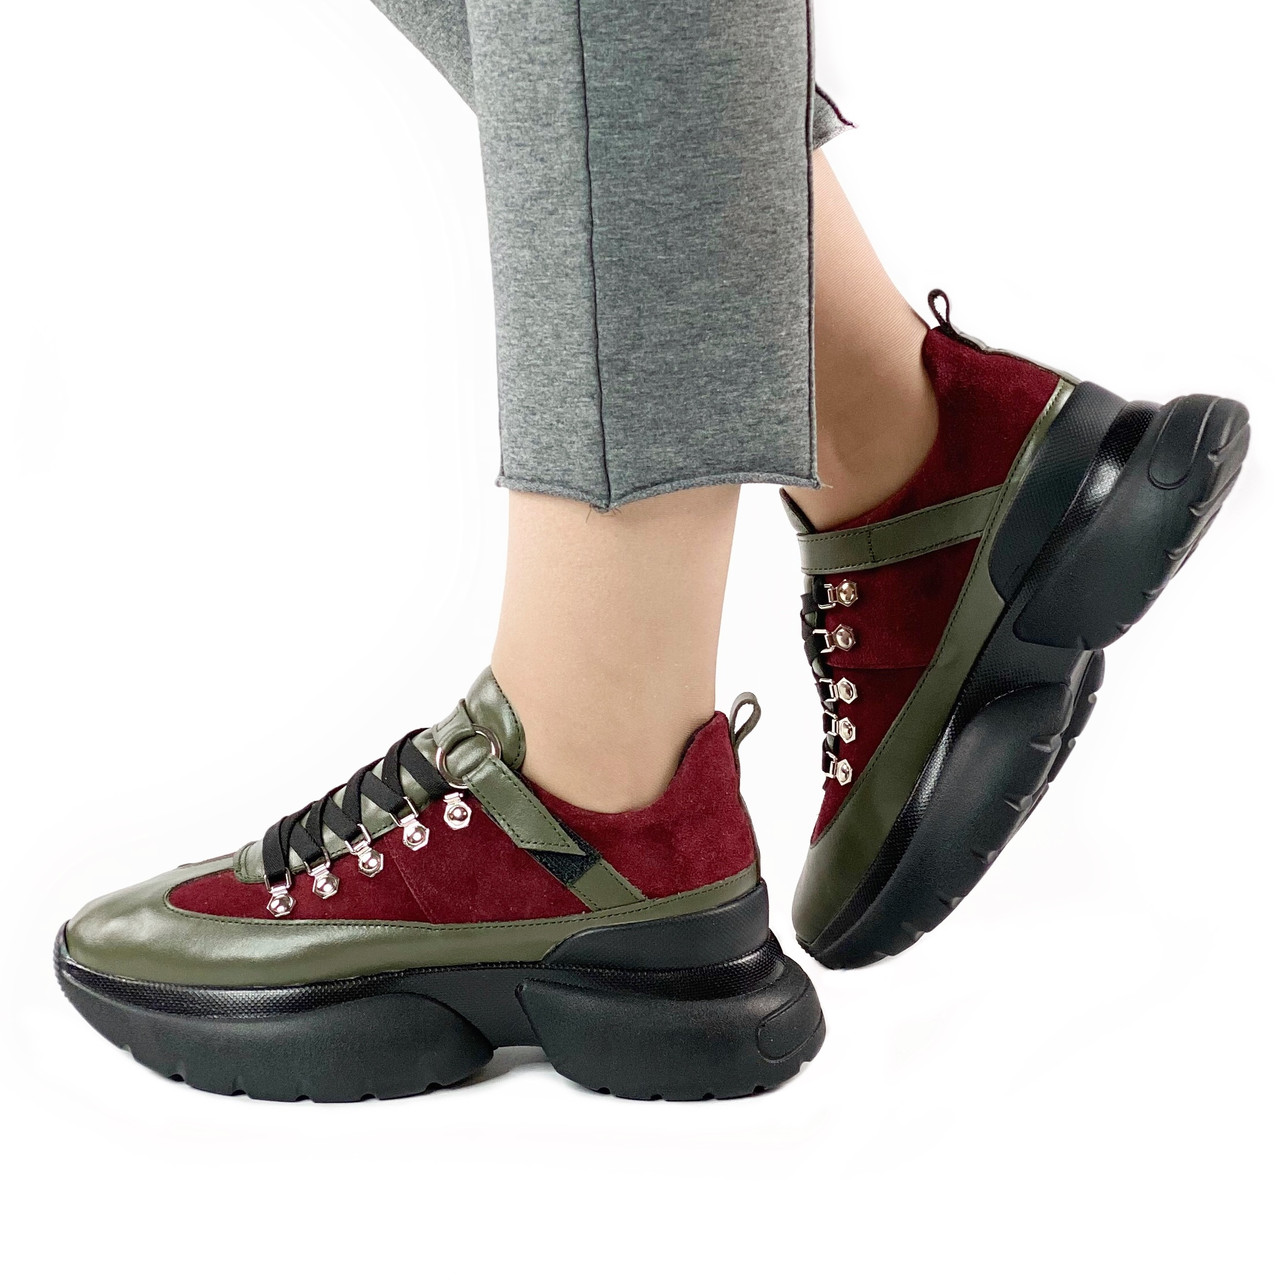 Жіночі кросівки MORENTO - хакі-бордові, натуральна шкіра, натуральна замша, весна/літо/осінь